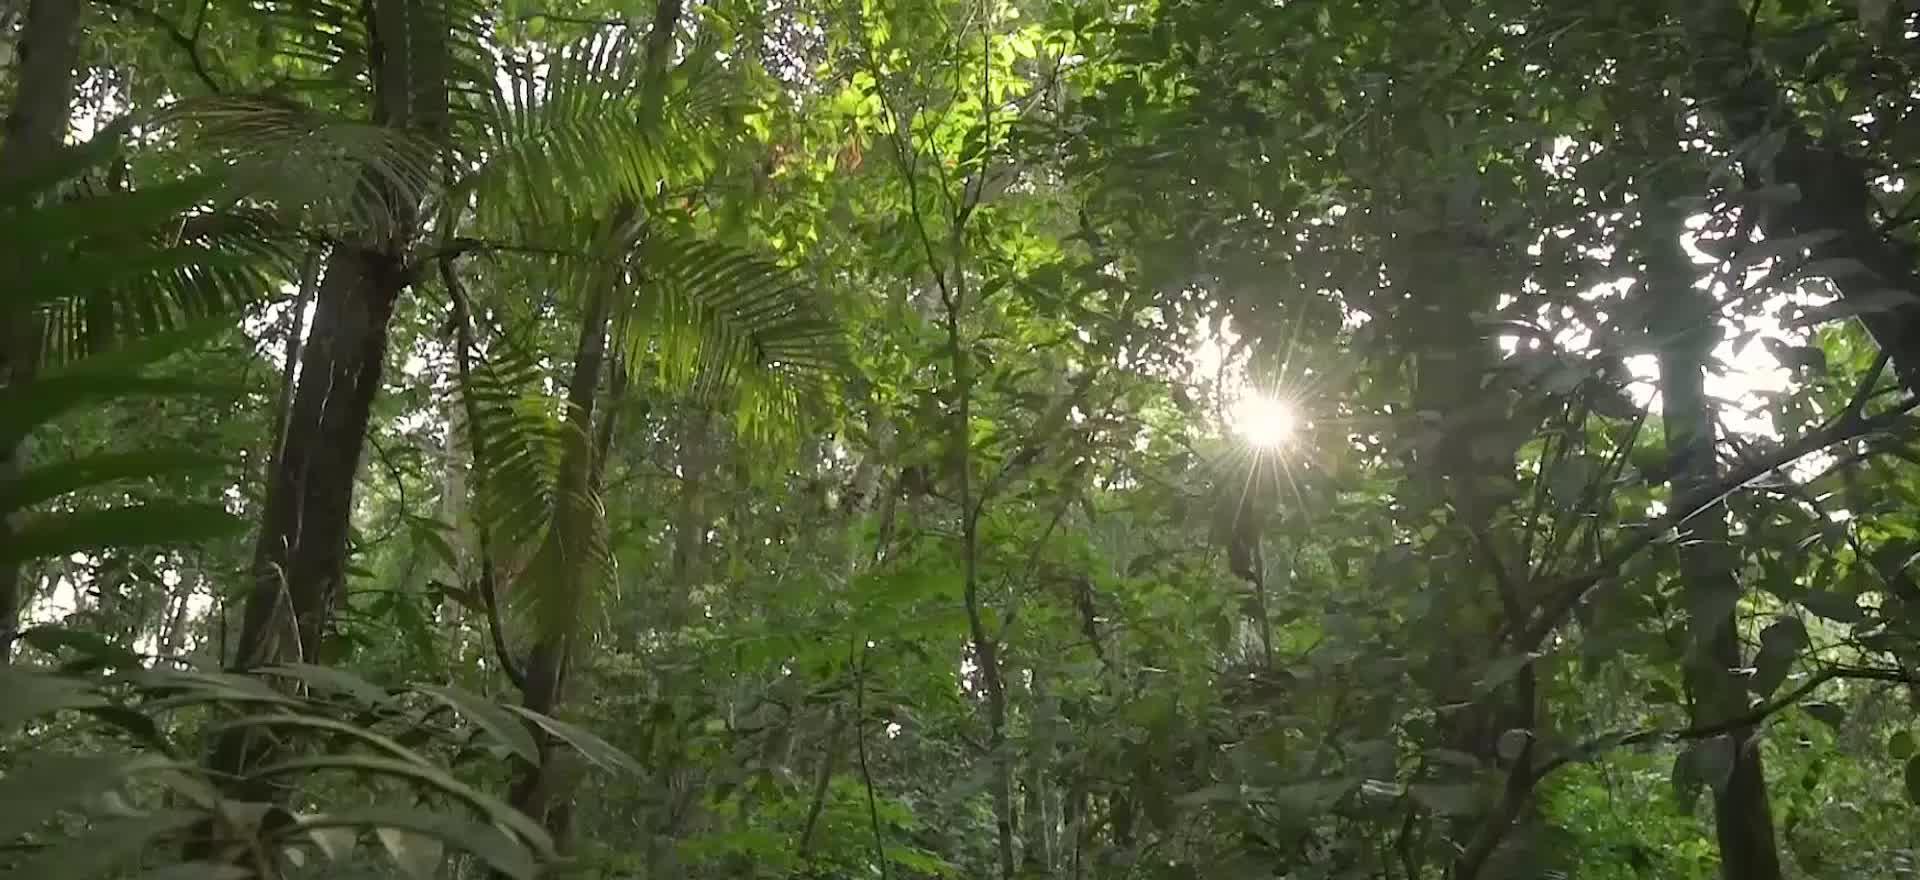 When Will The Amazon Rainforest Be Gone Rainforest